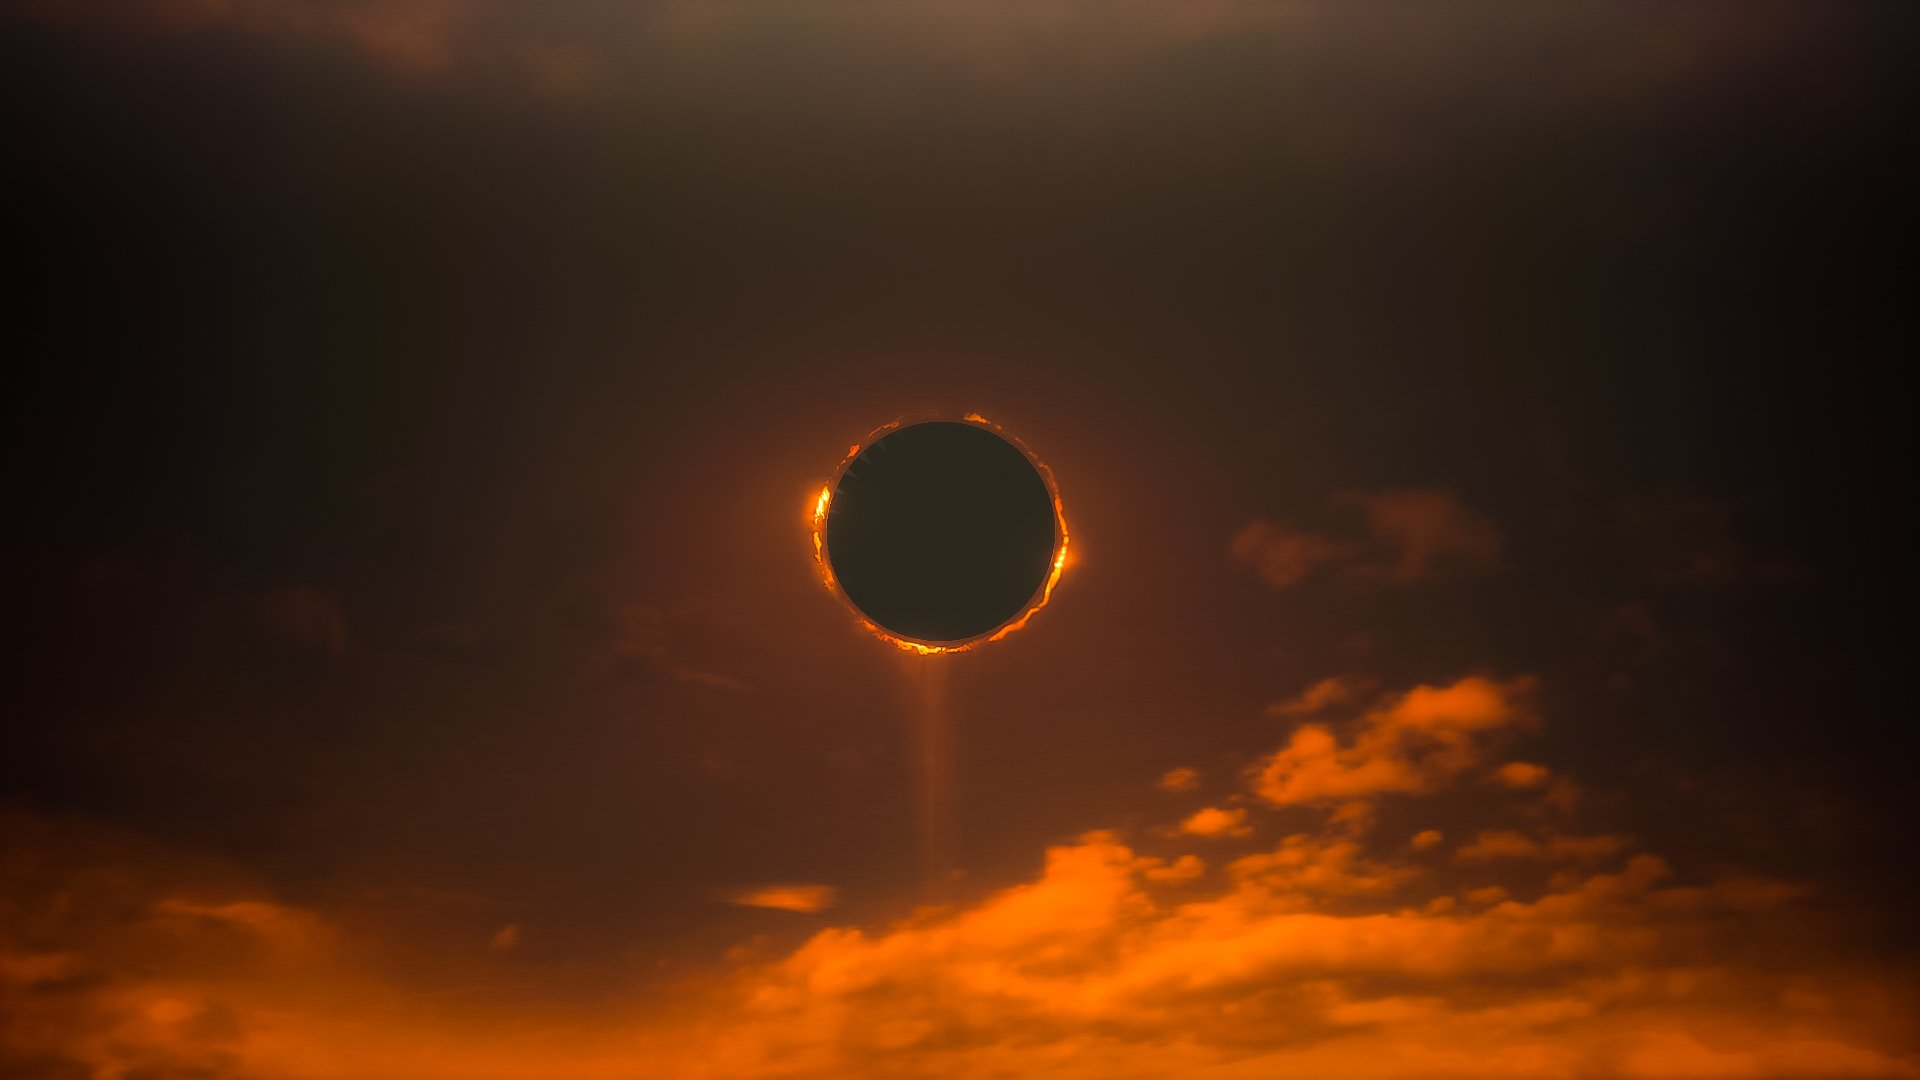 Солнечное затмение солнце облака небо затмение